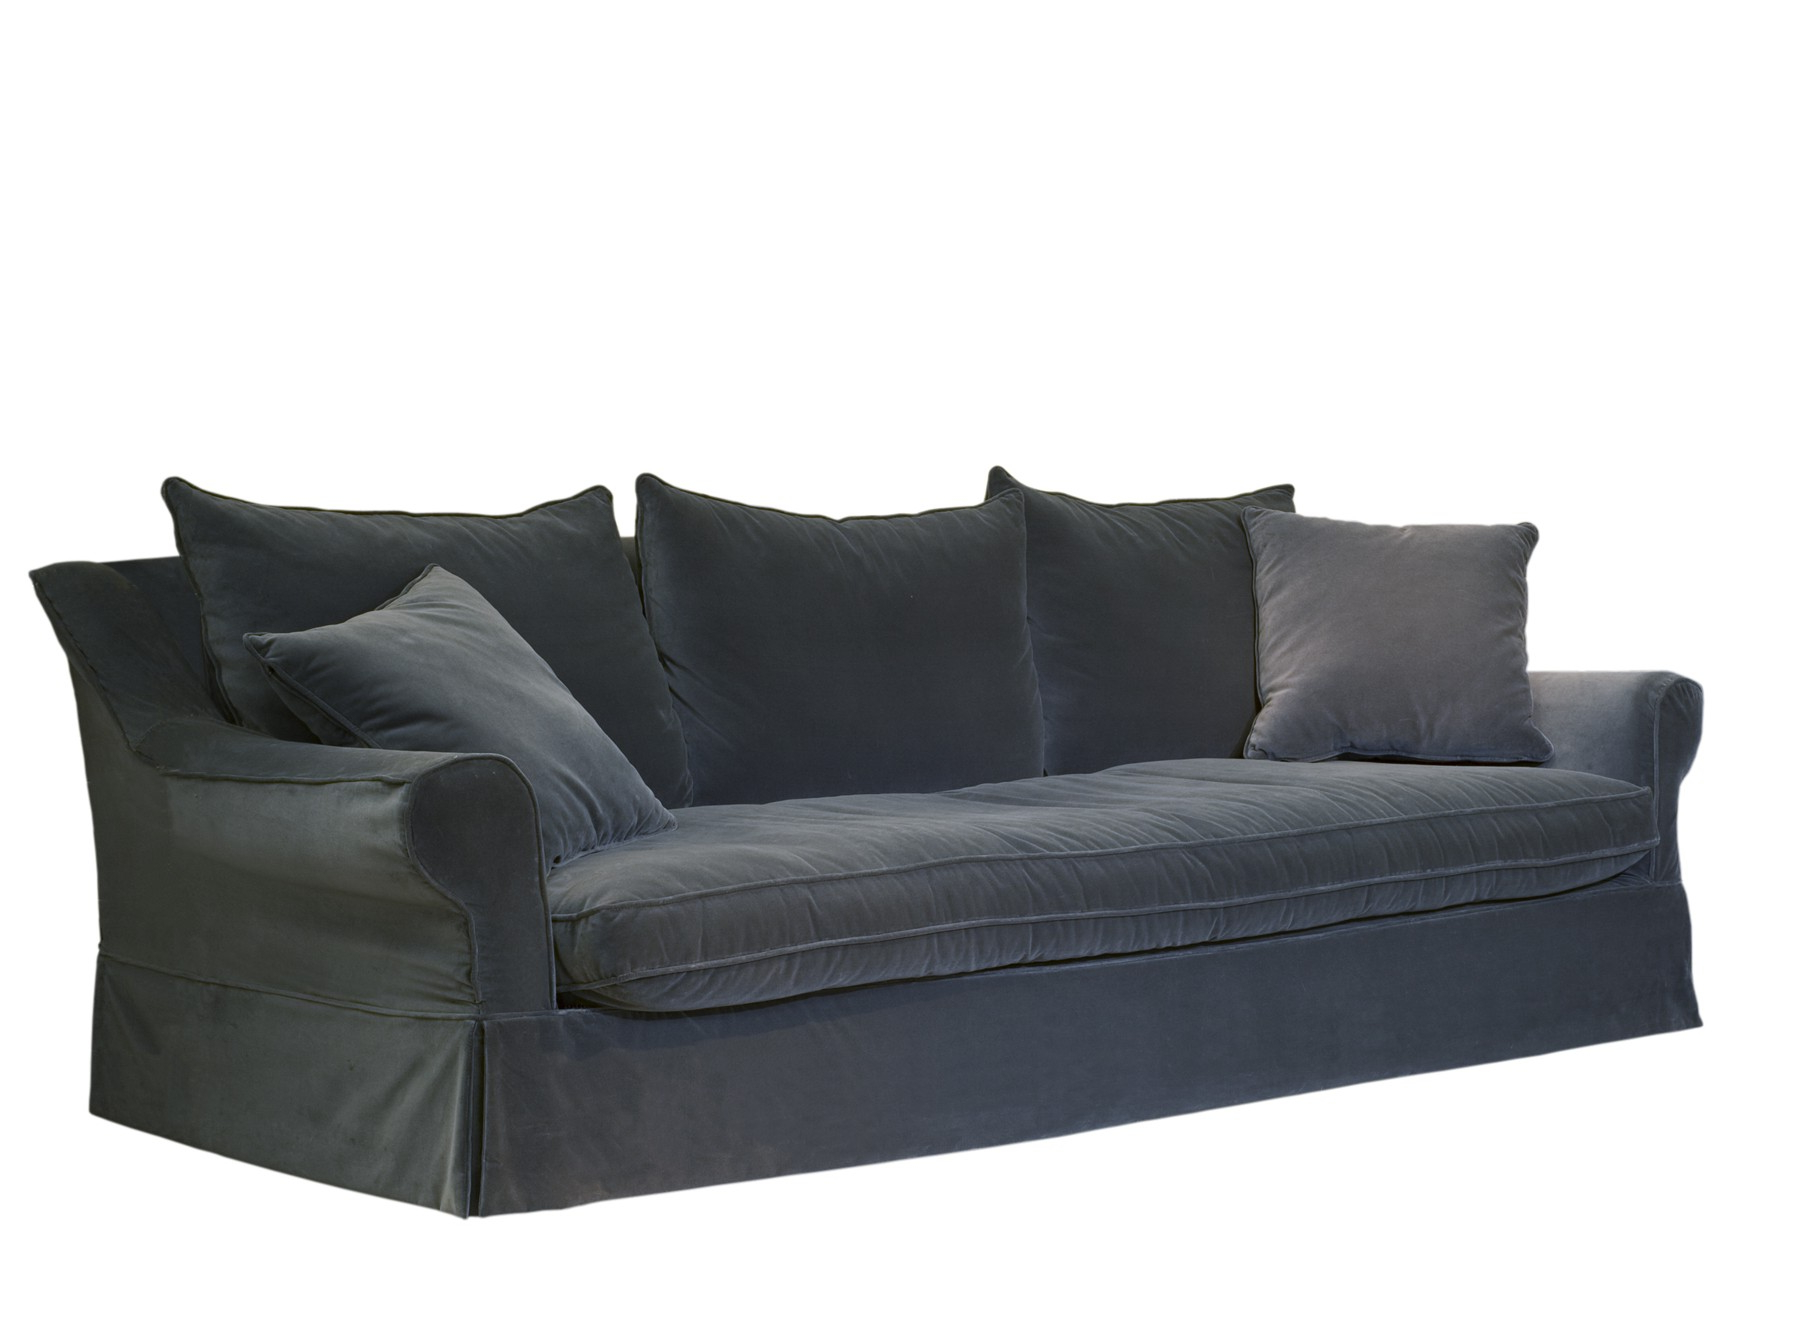 Tapizado De sofas Q5df Upholstery Roslyn sofa Becara Tienda Online